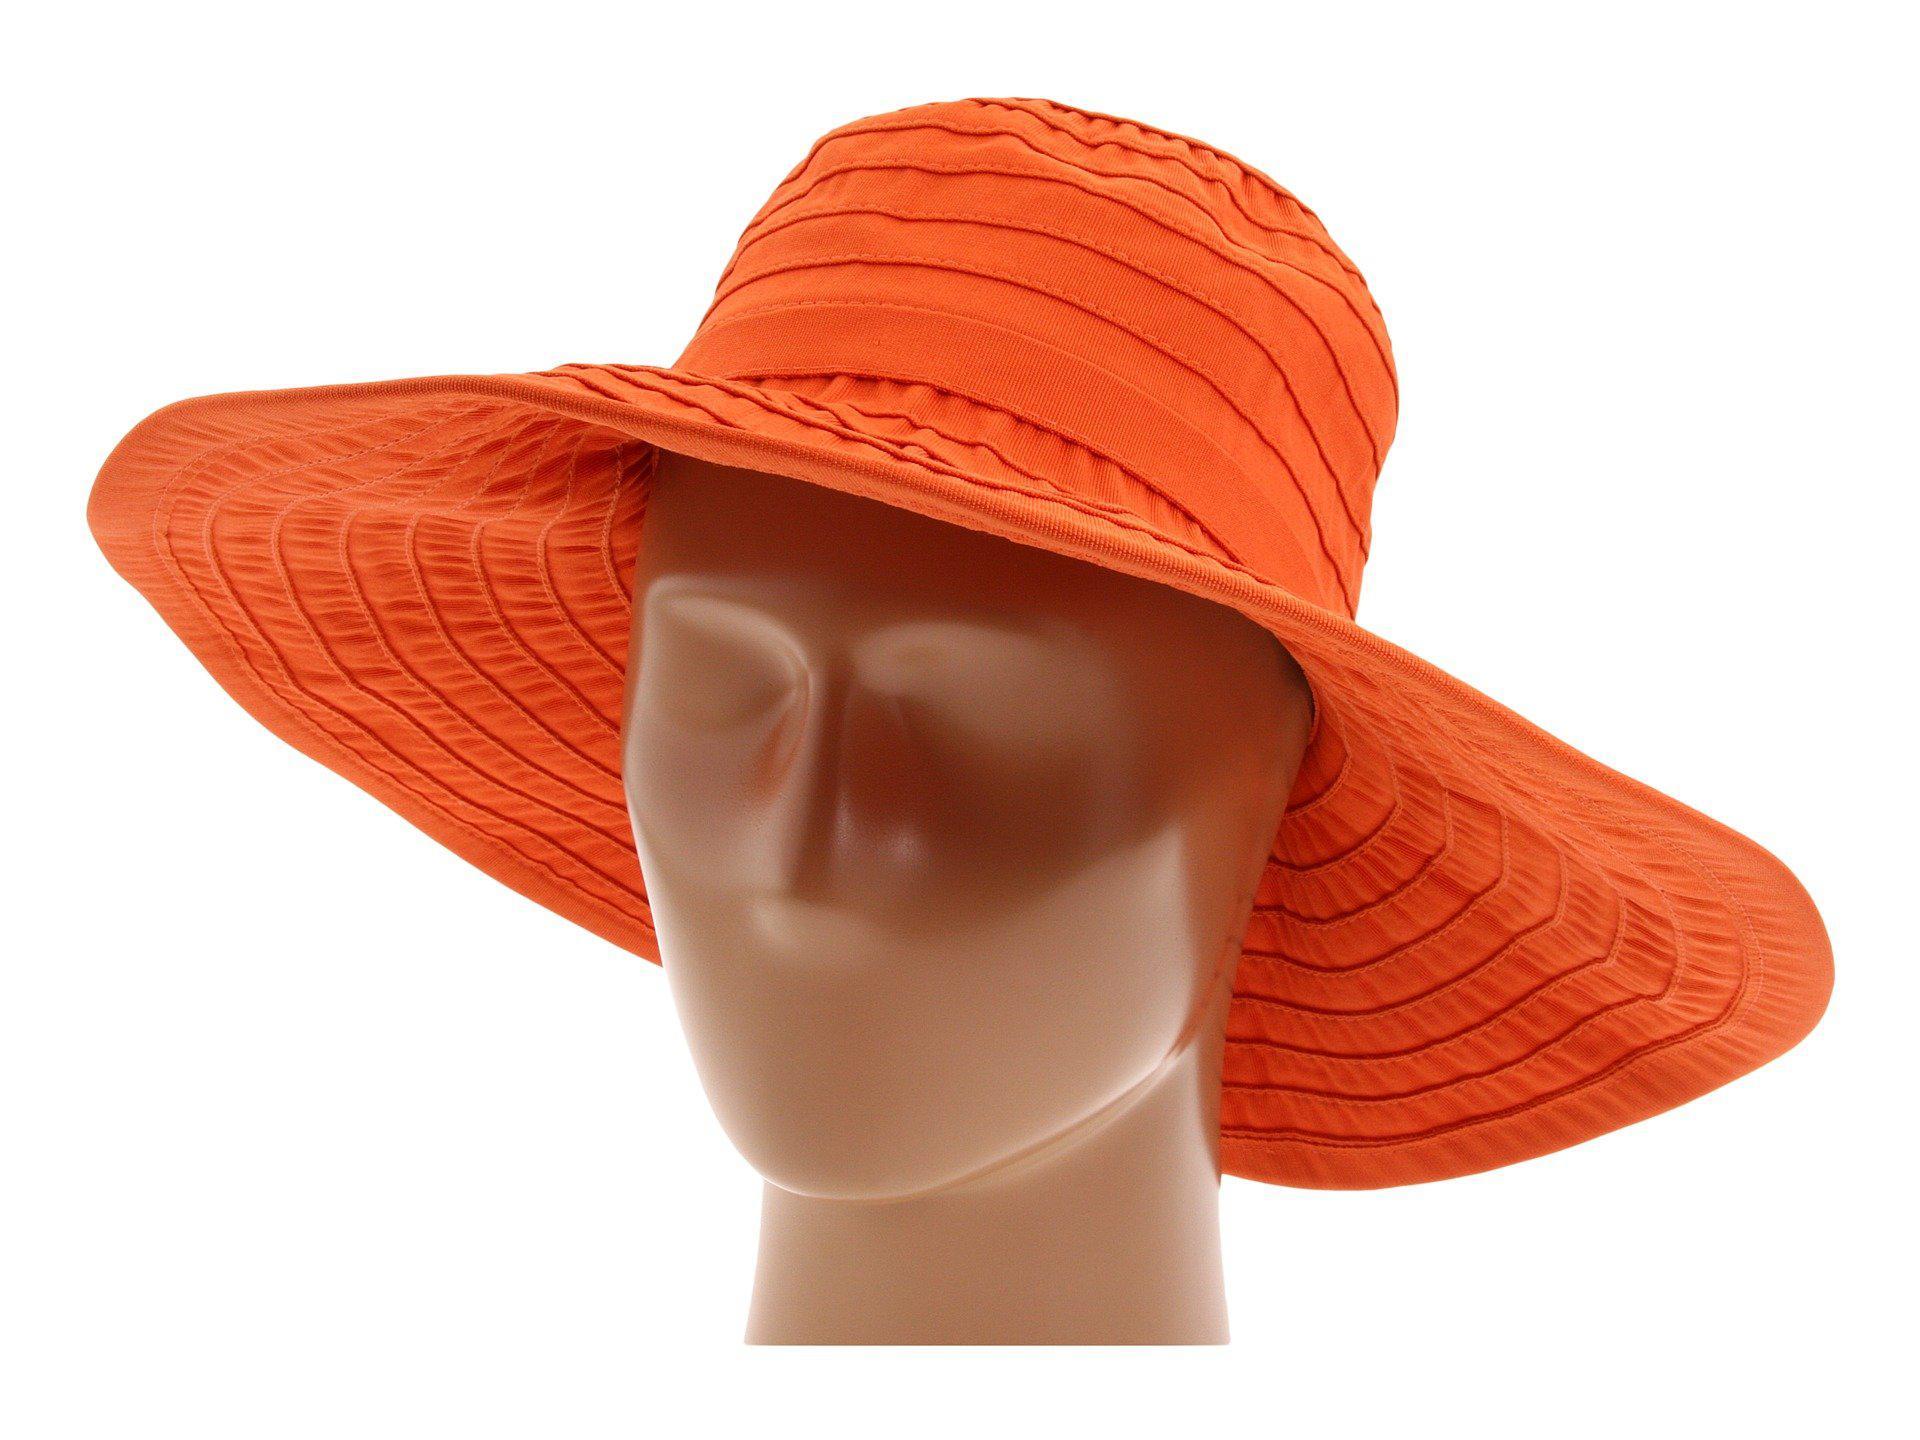 e4d4a8ba4b60e San Diego Hat Company. Women s Orange Rbl299 Crushable Ribbon Floppy ...